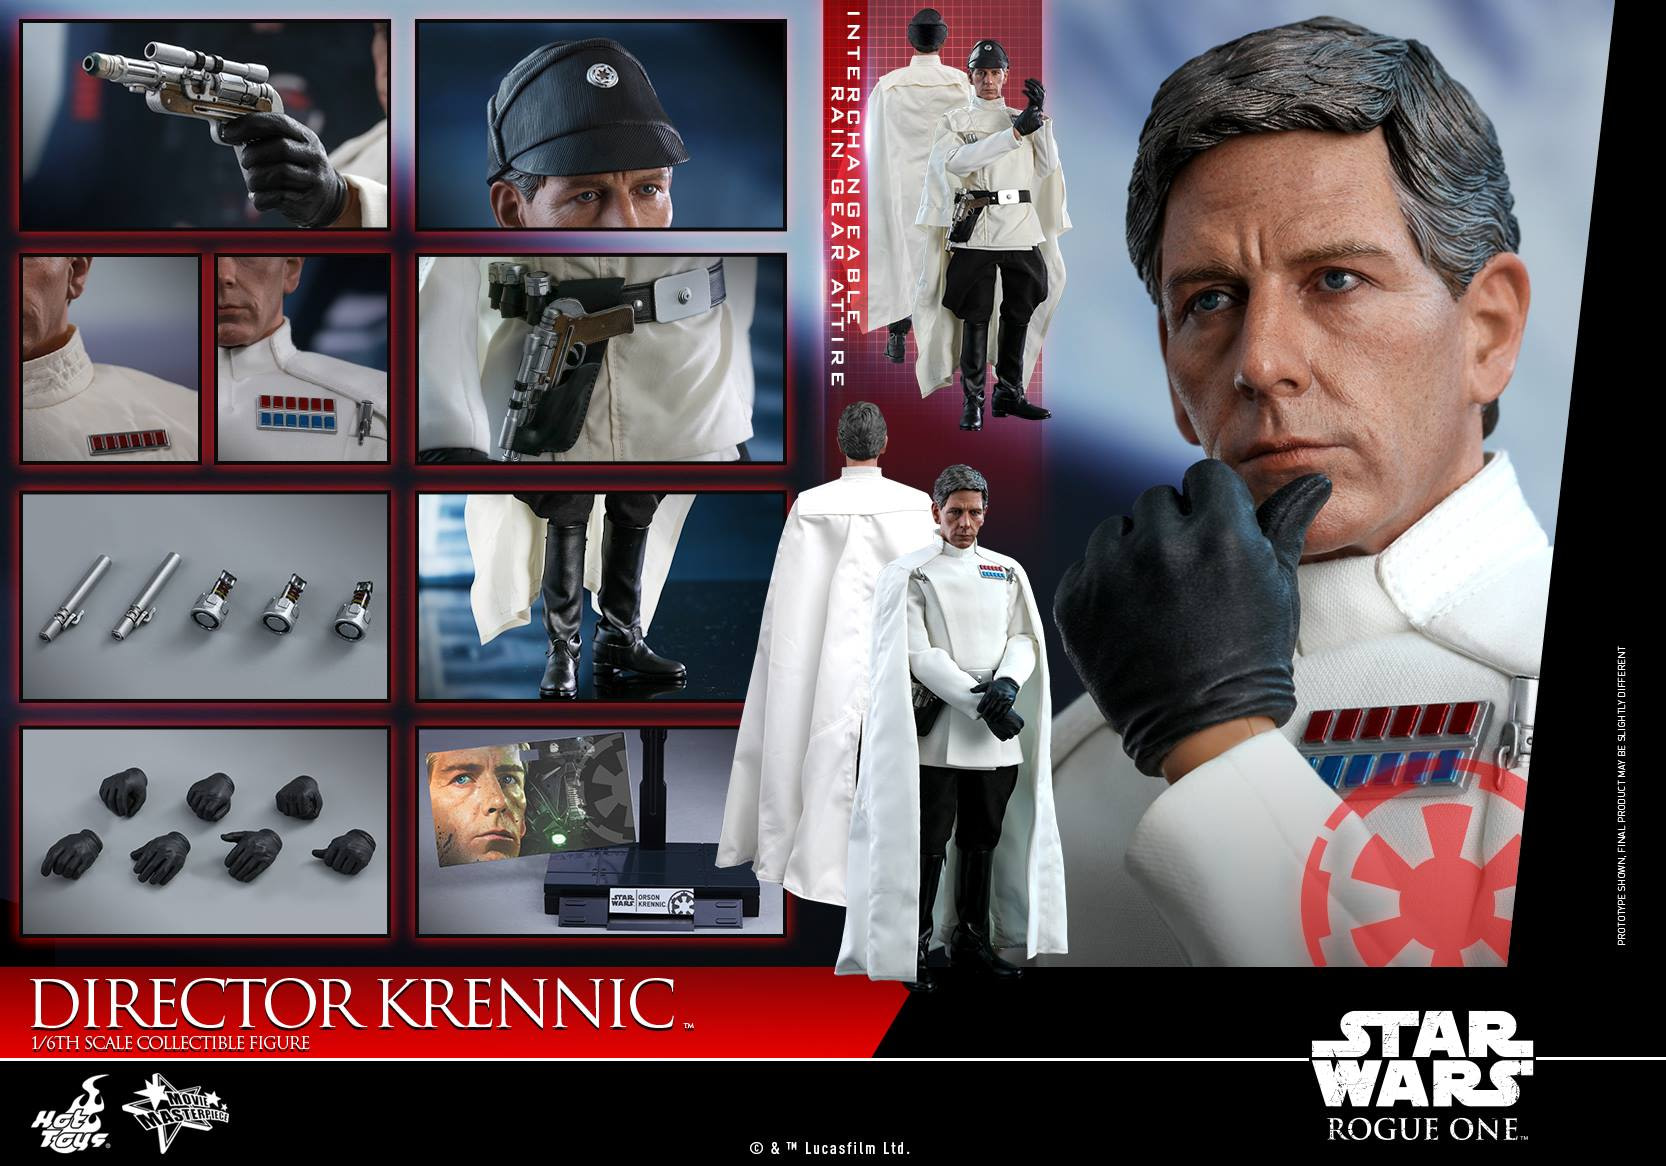 Star Wars Hot Toys Director Krennic 13